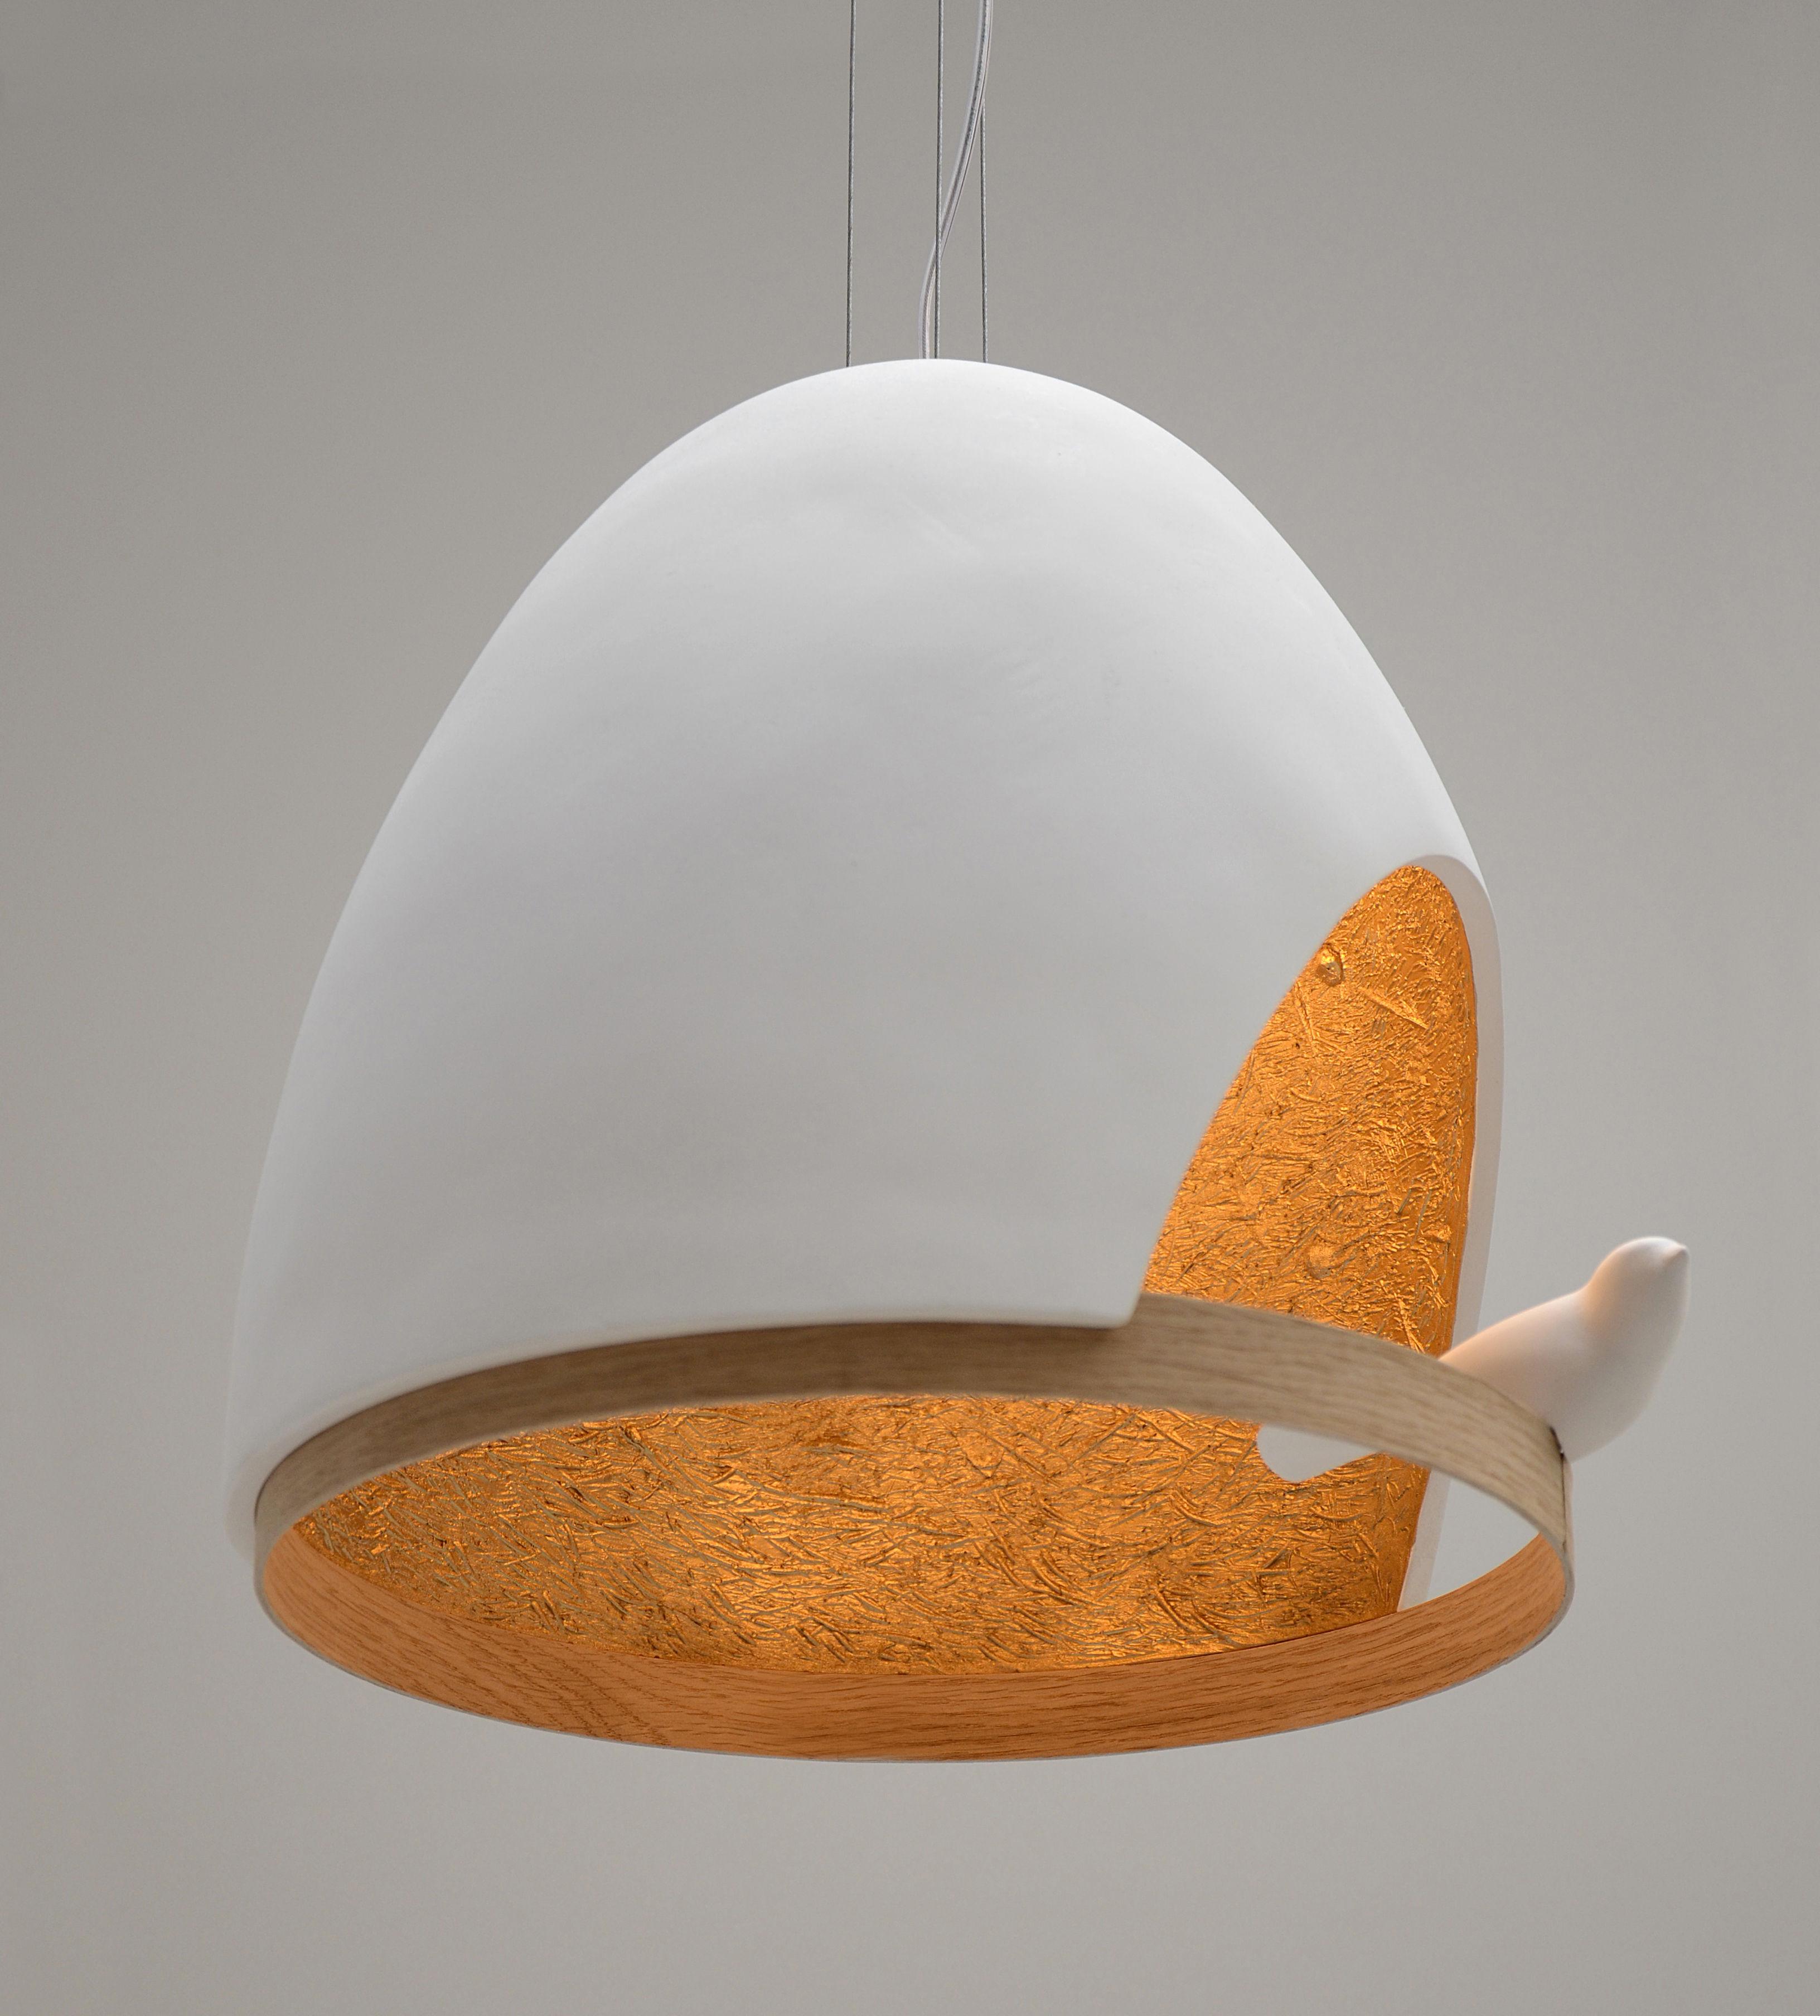 oiseau pendelleuchte aus gips wei innenseite goldfarben by compagnie made in design. Black Bedroom Furniture Sets. Home Design Ideas